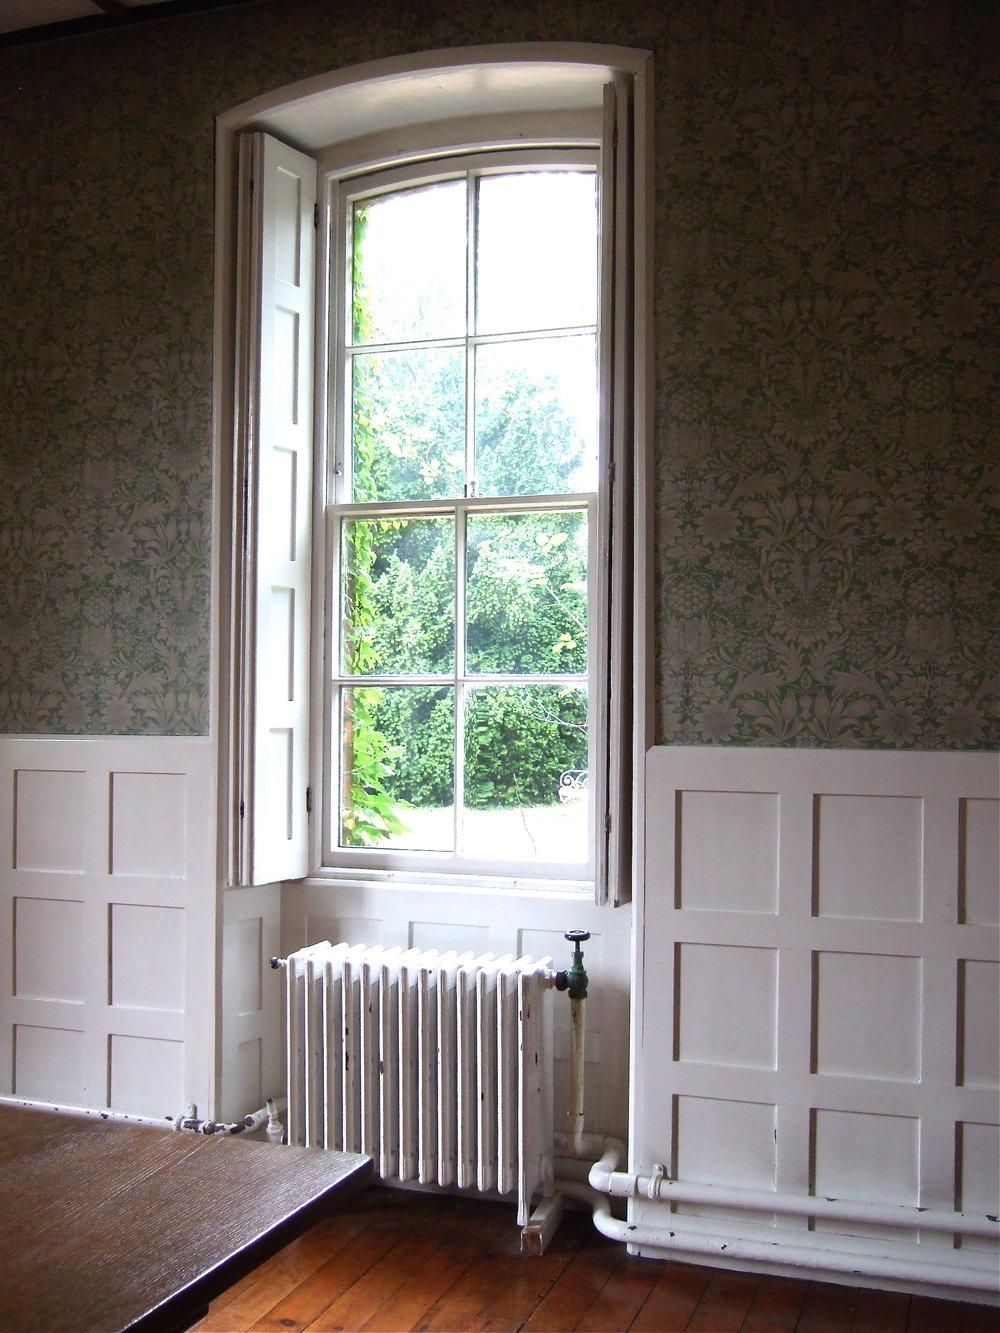 redhouse interior.jpg